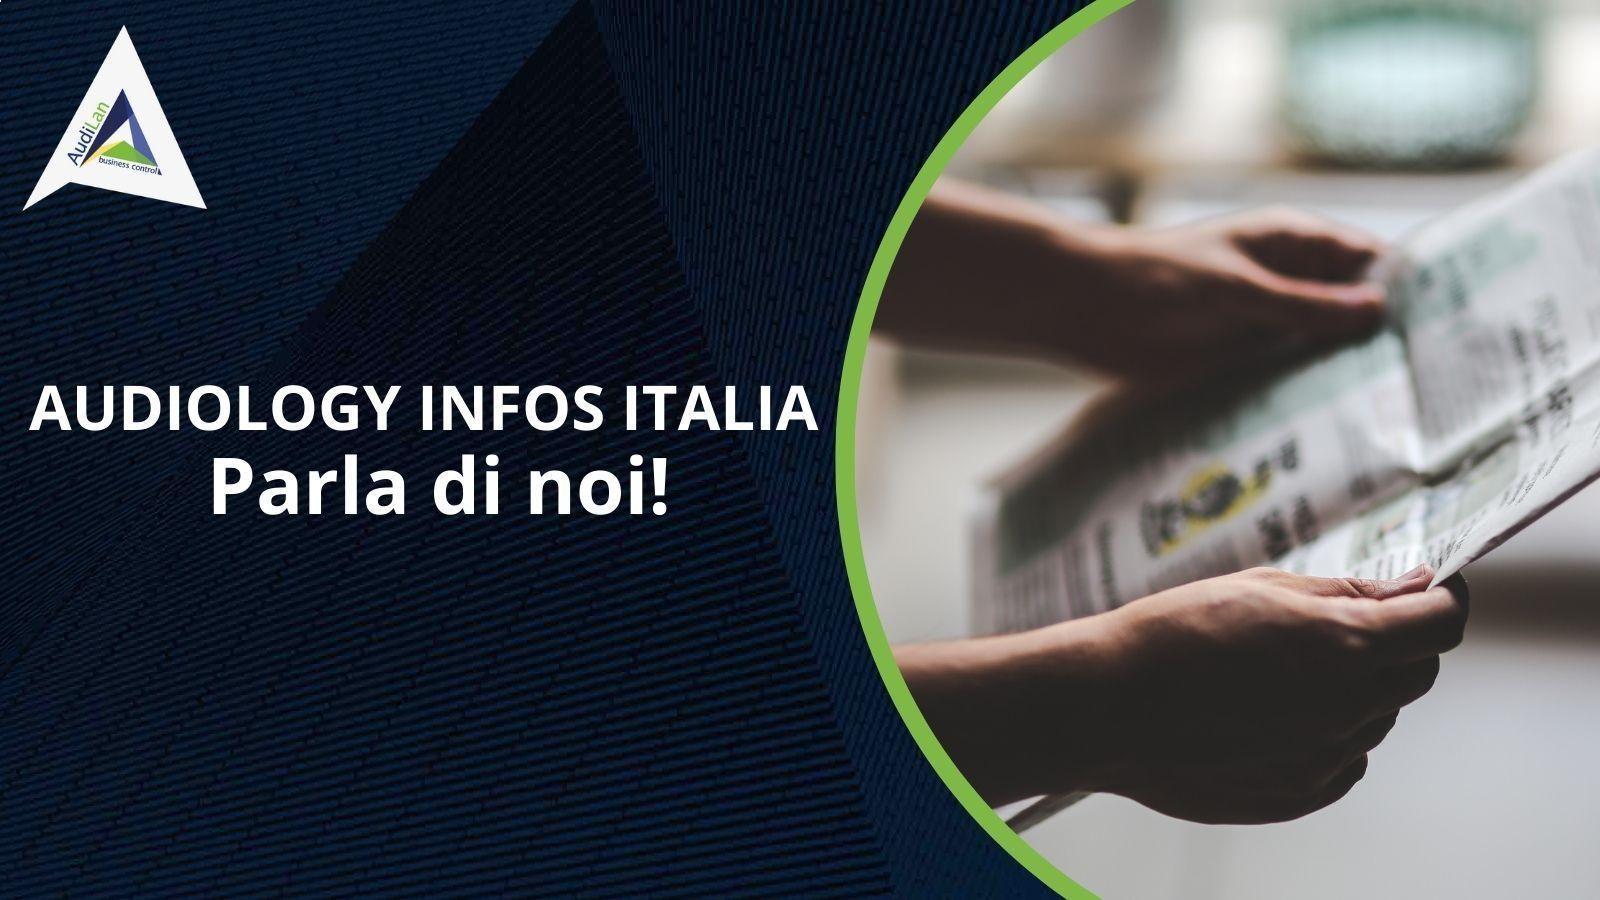 audiology-infos-italia-parla-di-noi